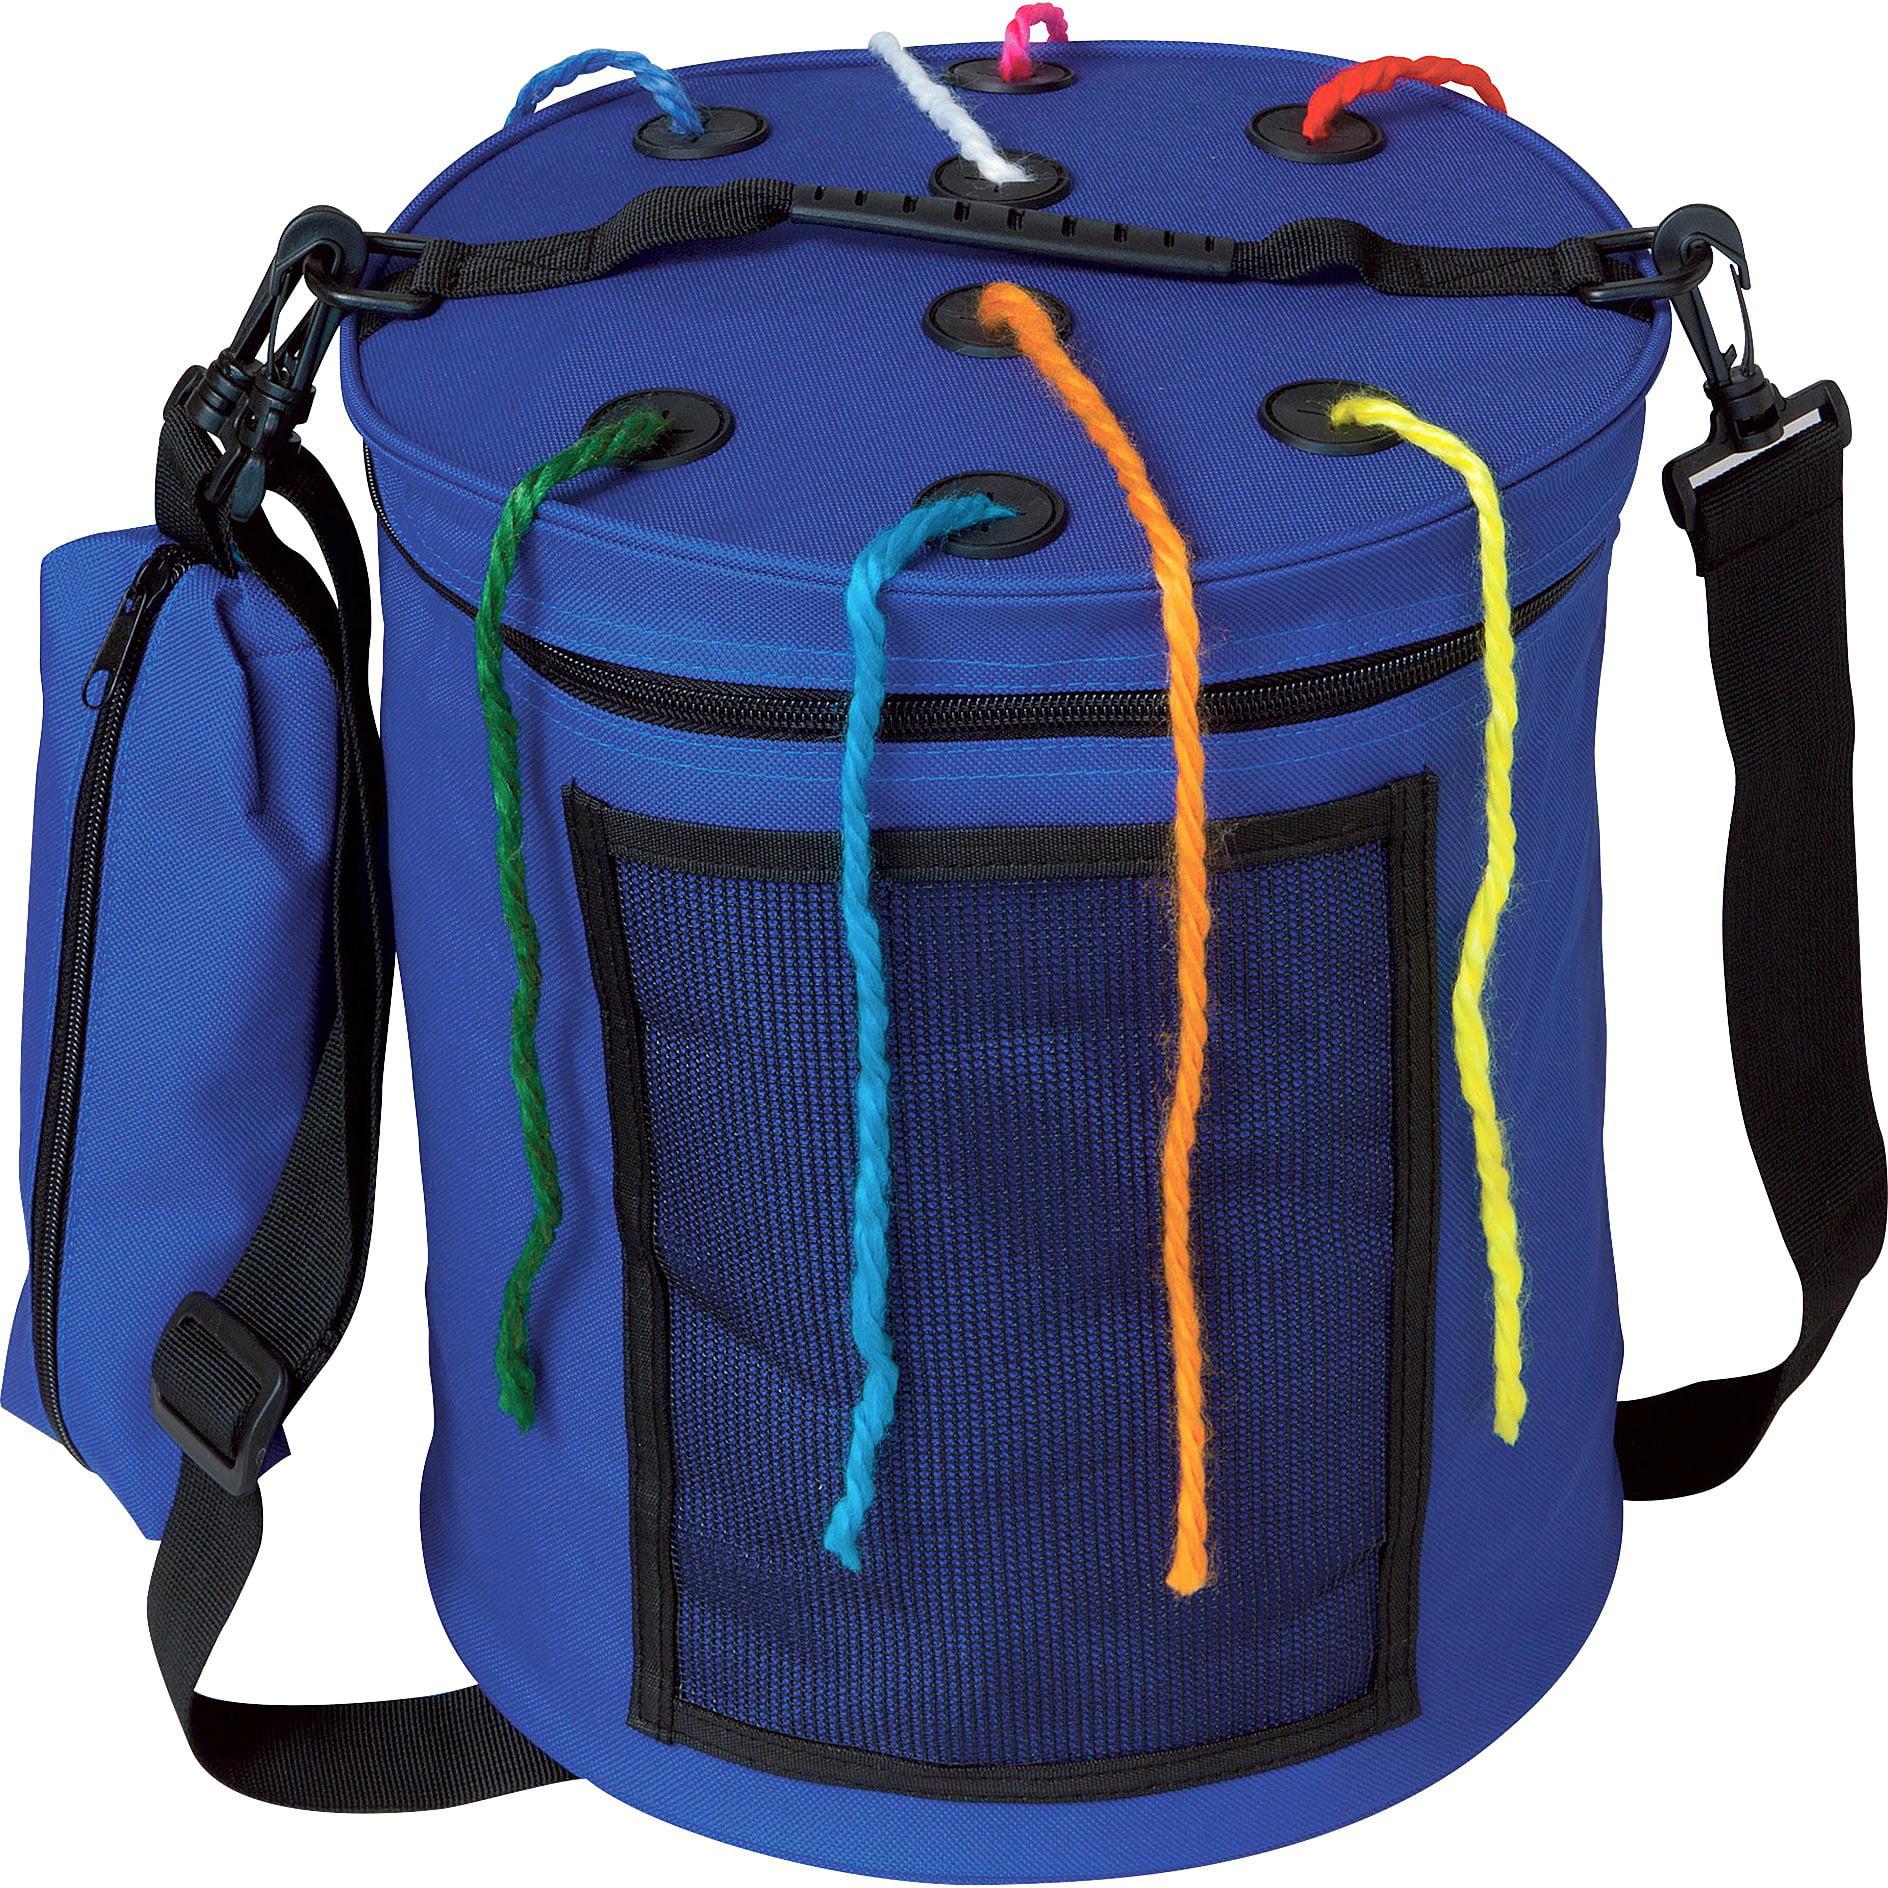 Pacon, PAC0000875, Yarn Tote, 1, Blue